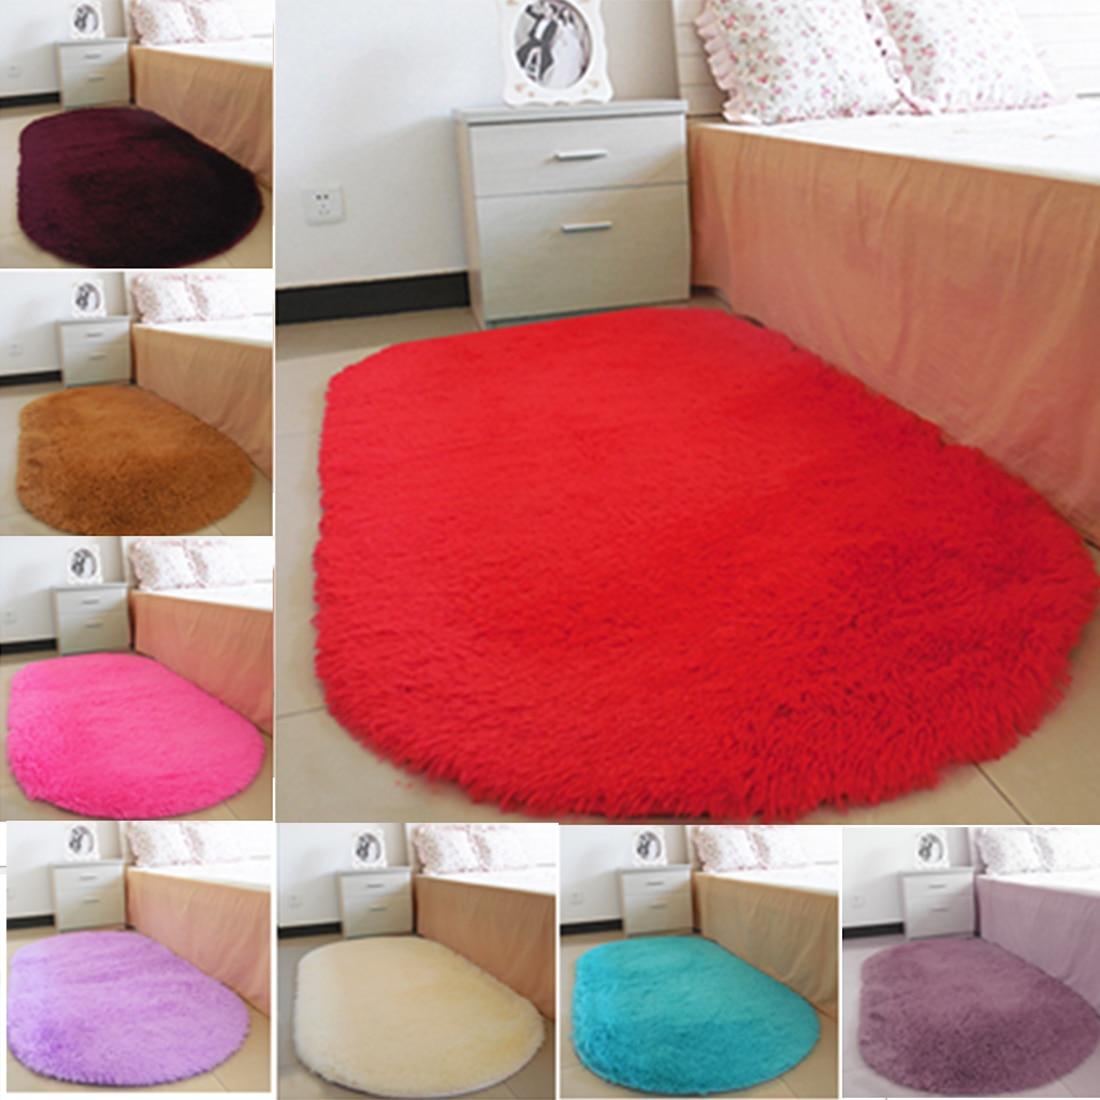 1Pcs Bathroom Carpets Oval Absorbent Soft Memory  Carpets For Living Room Tapis Salon Floor Rugs Non-slip Bath Mats